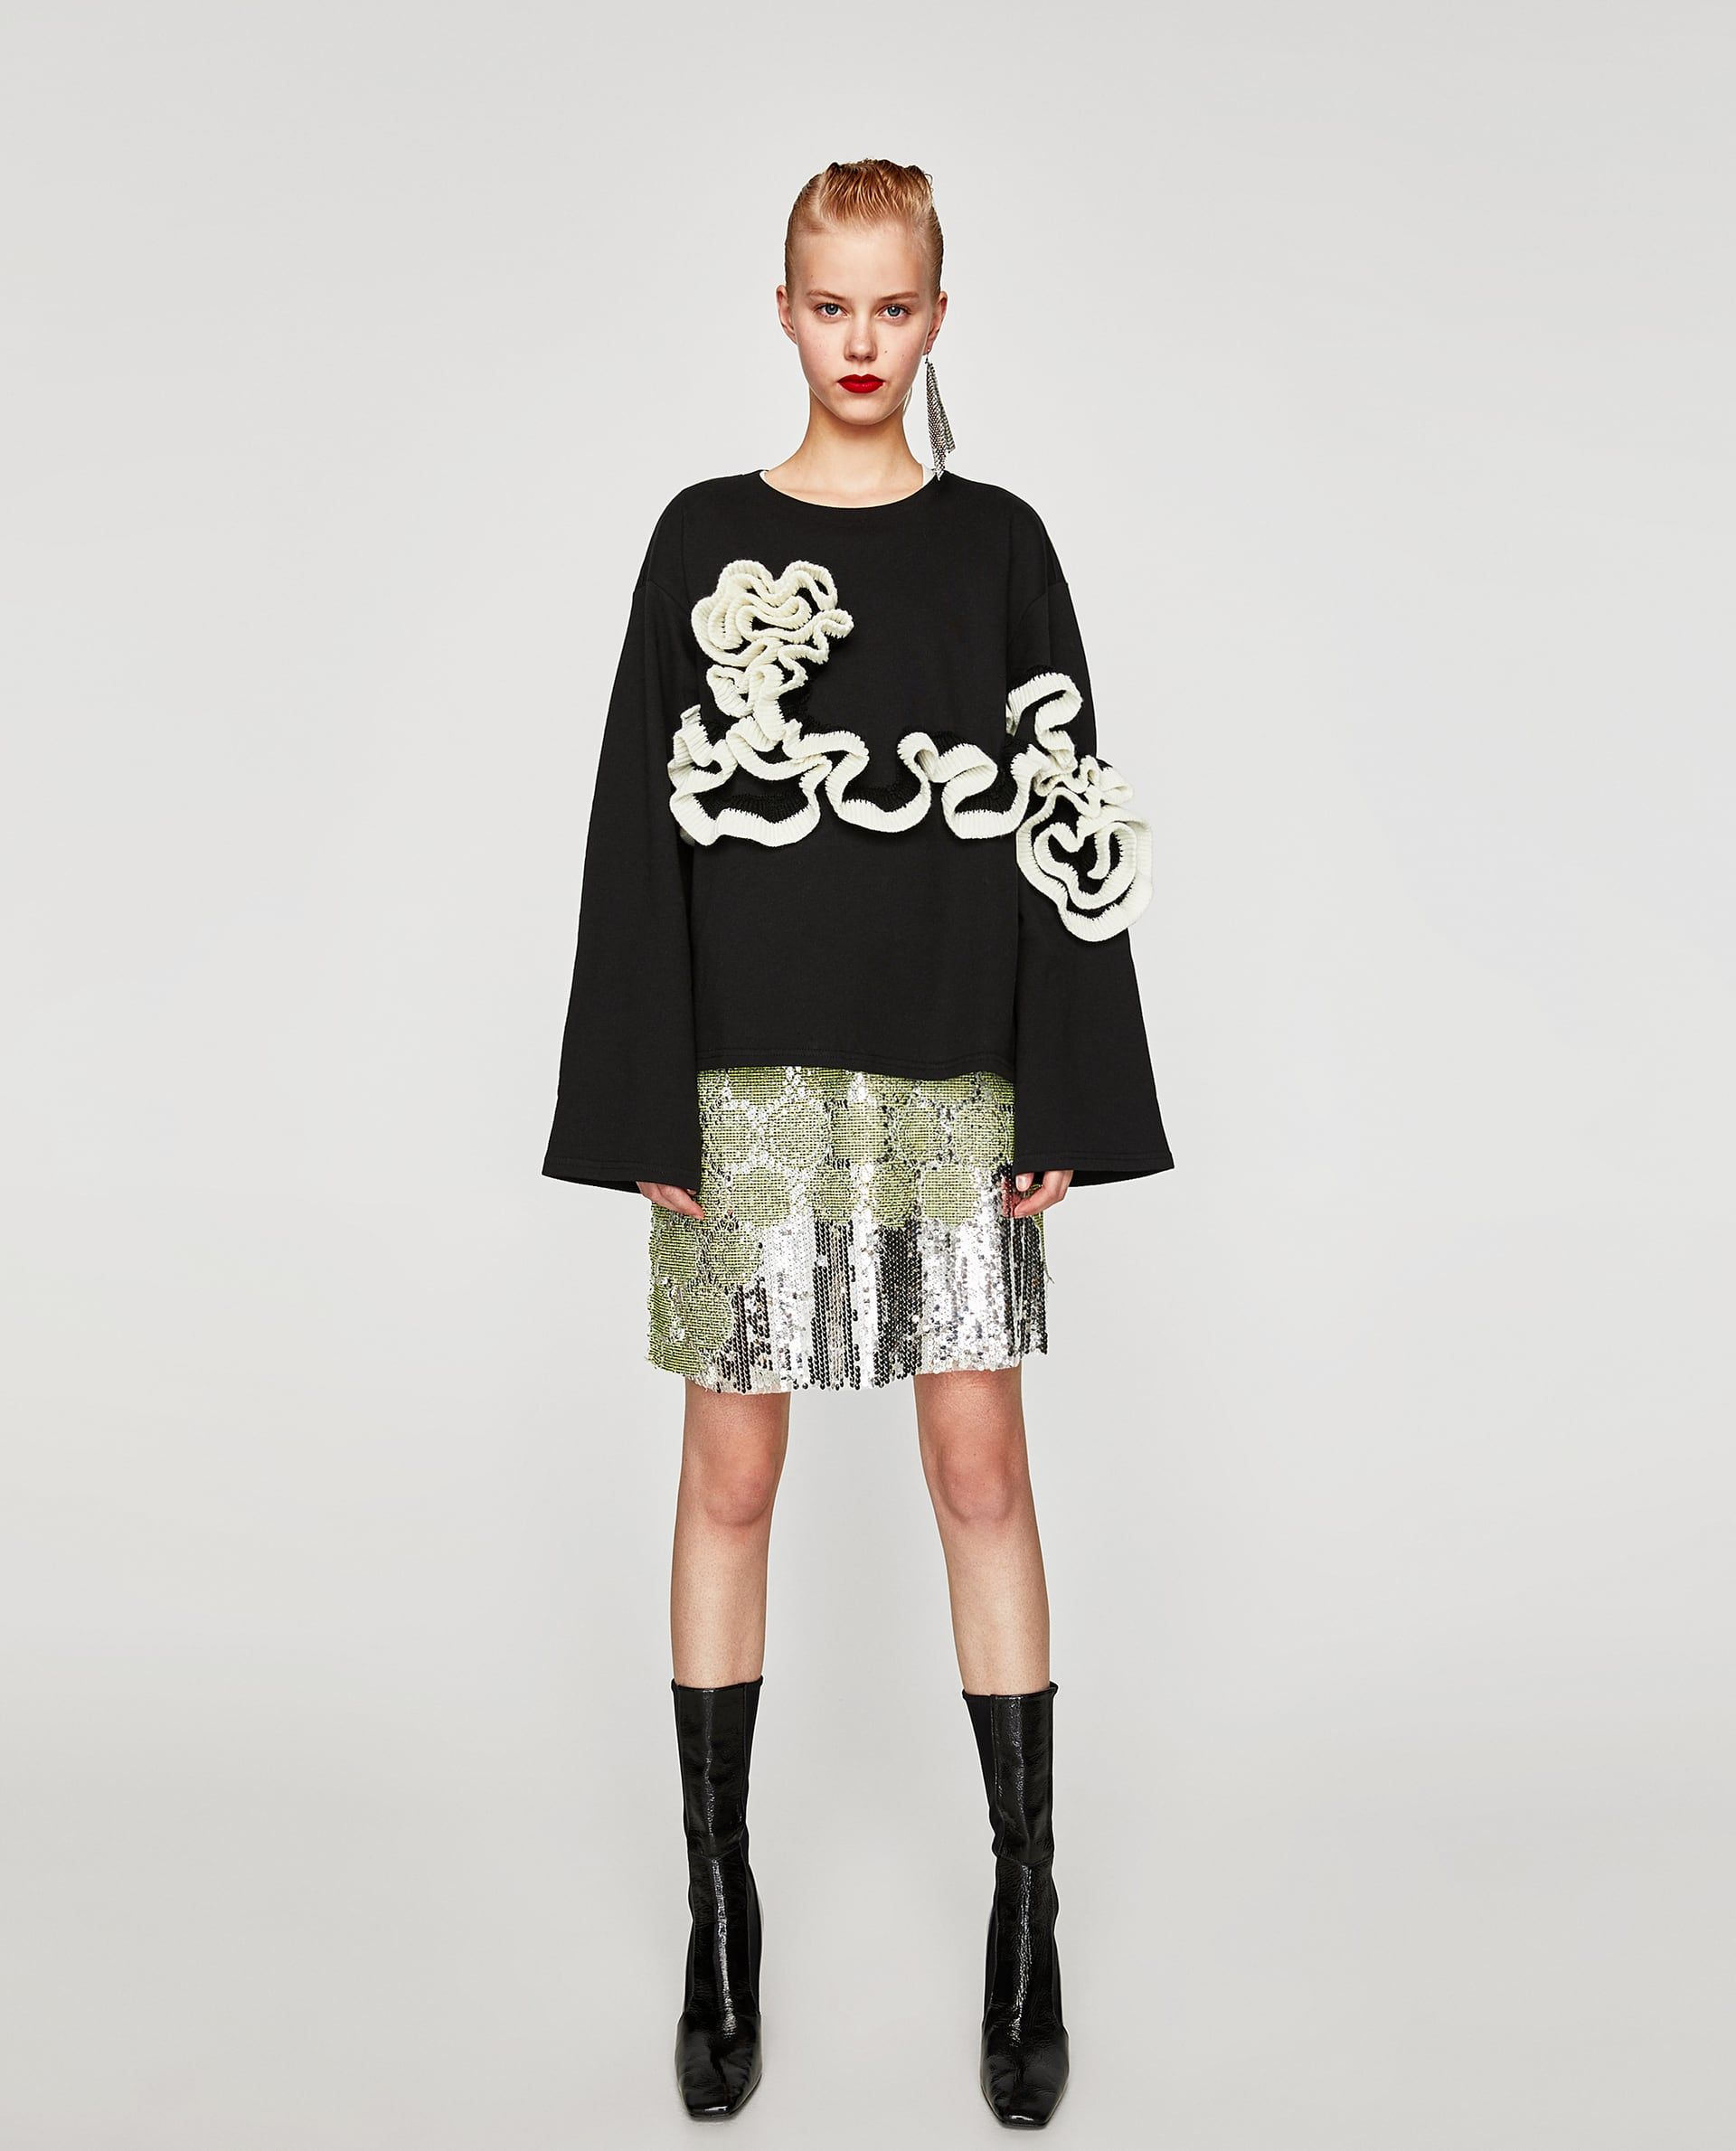 SUDADERA BANDERA   AW 2017 Wishlist   Zara, Aw 2017, Clothes